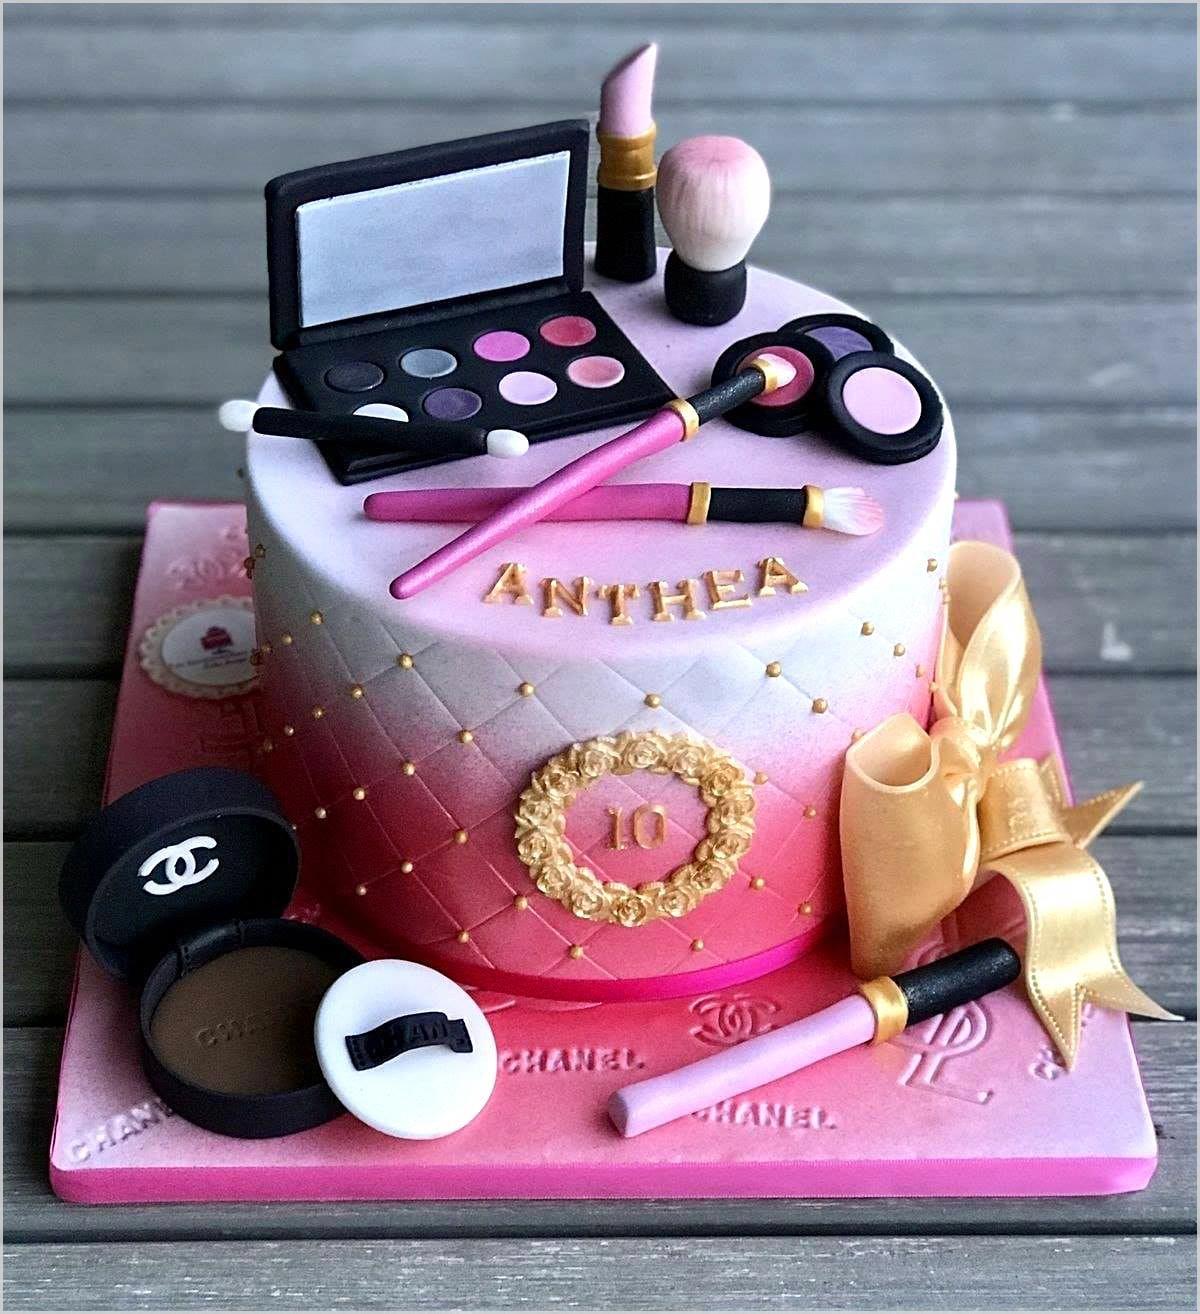 Marvelous Beautiful Birthday Cakes Image By Layla Khoury In 2020 Birthday Funny Birthday Cards Online Sheoxdamsfinfo